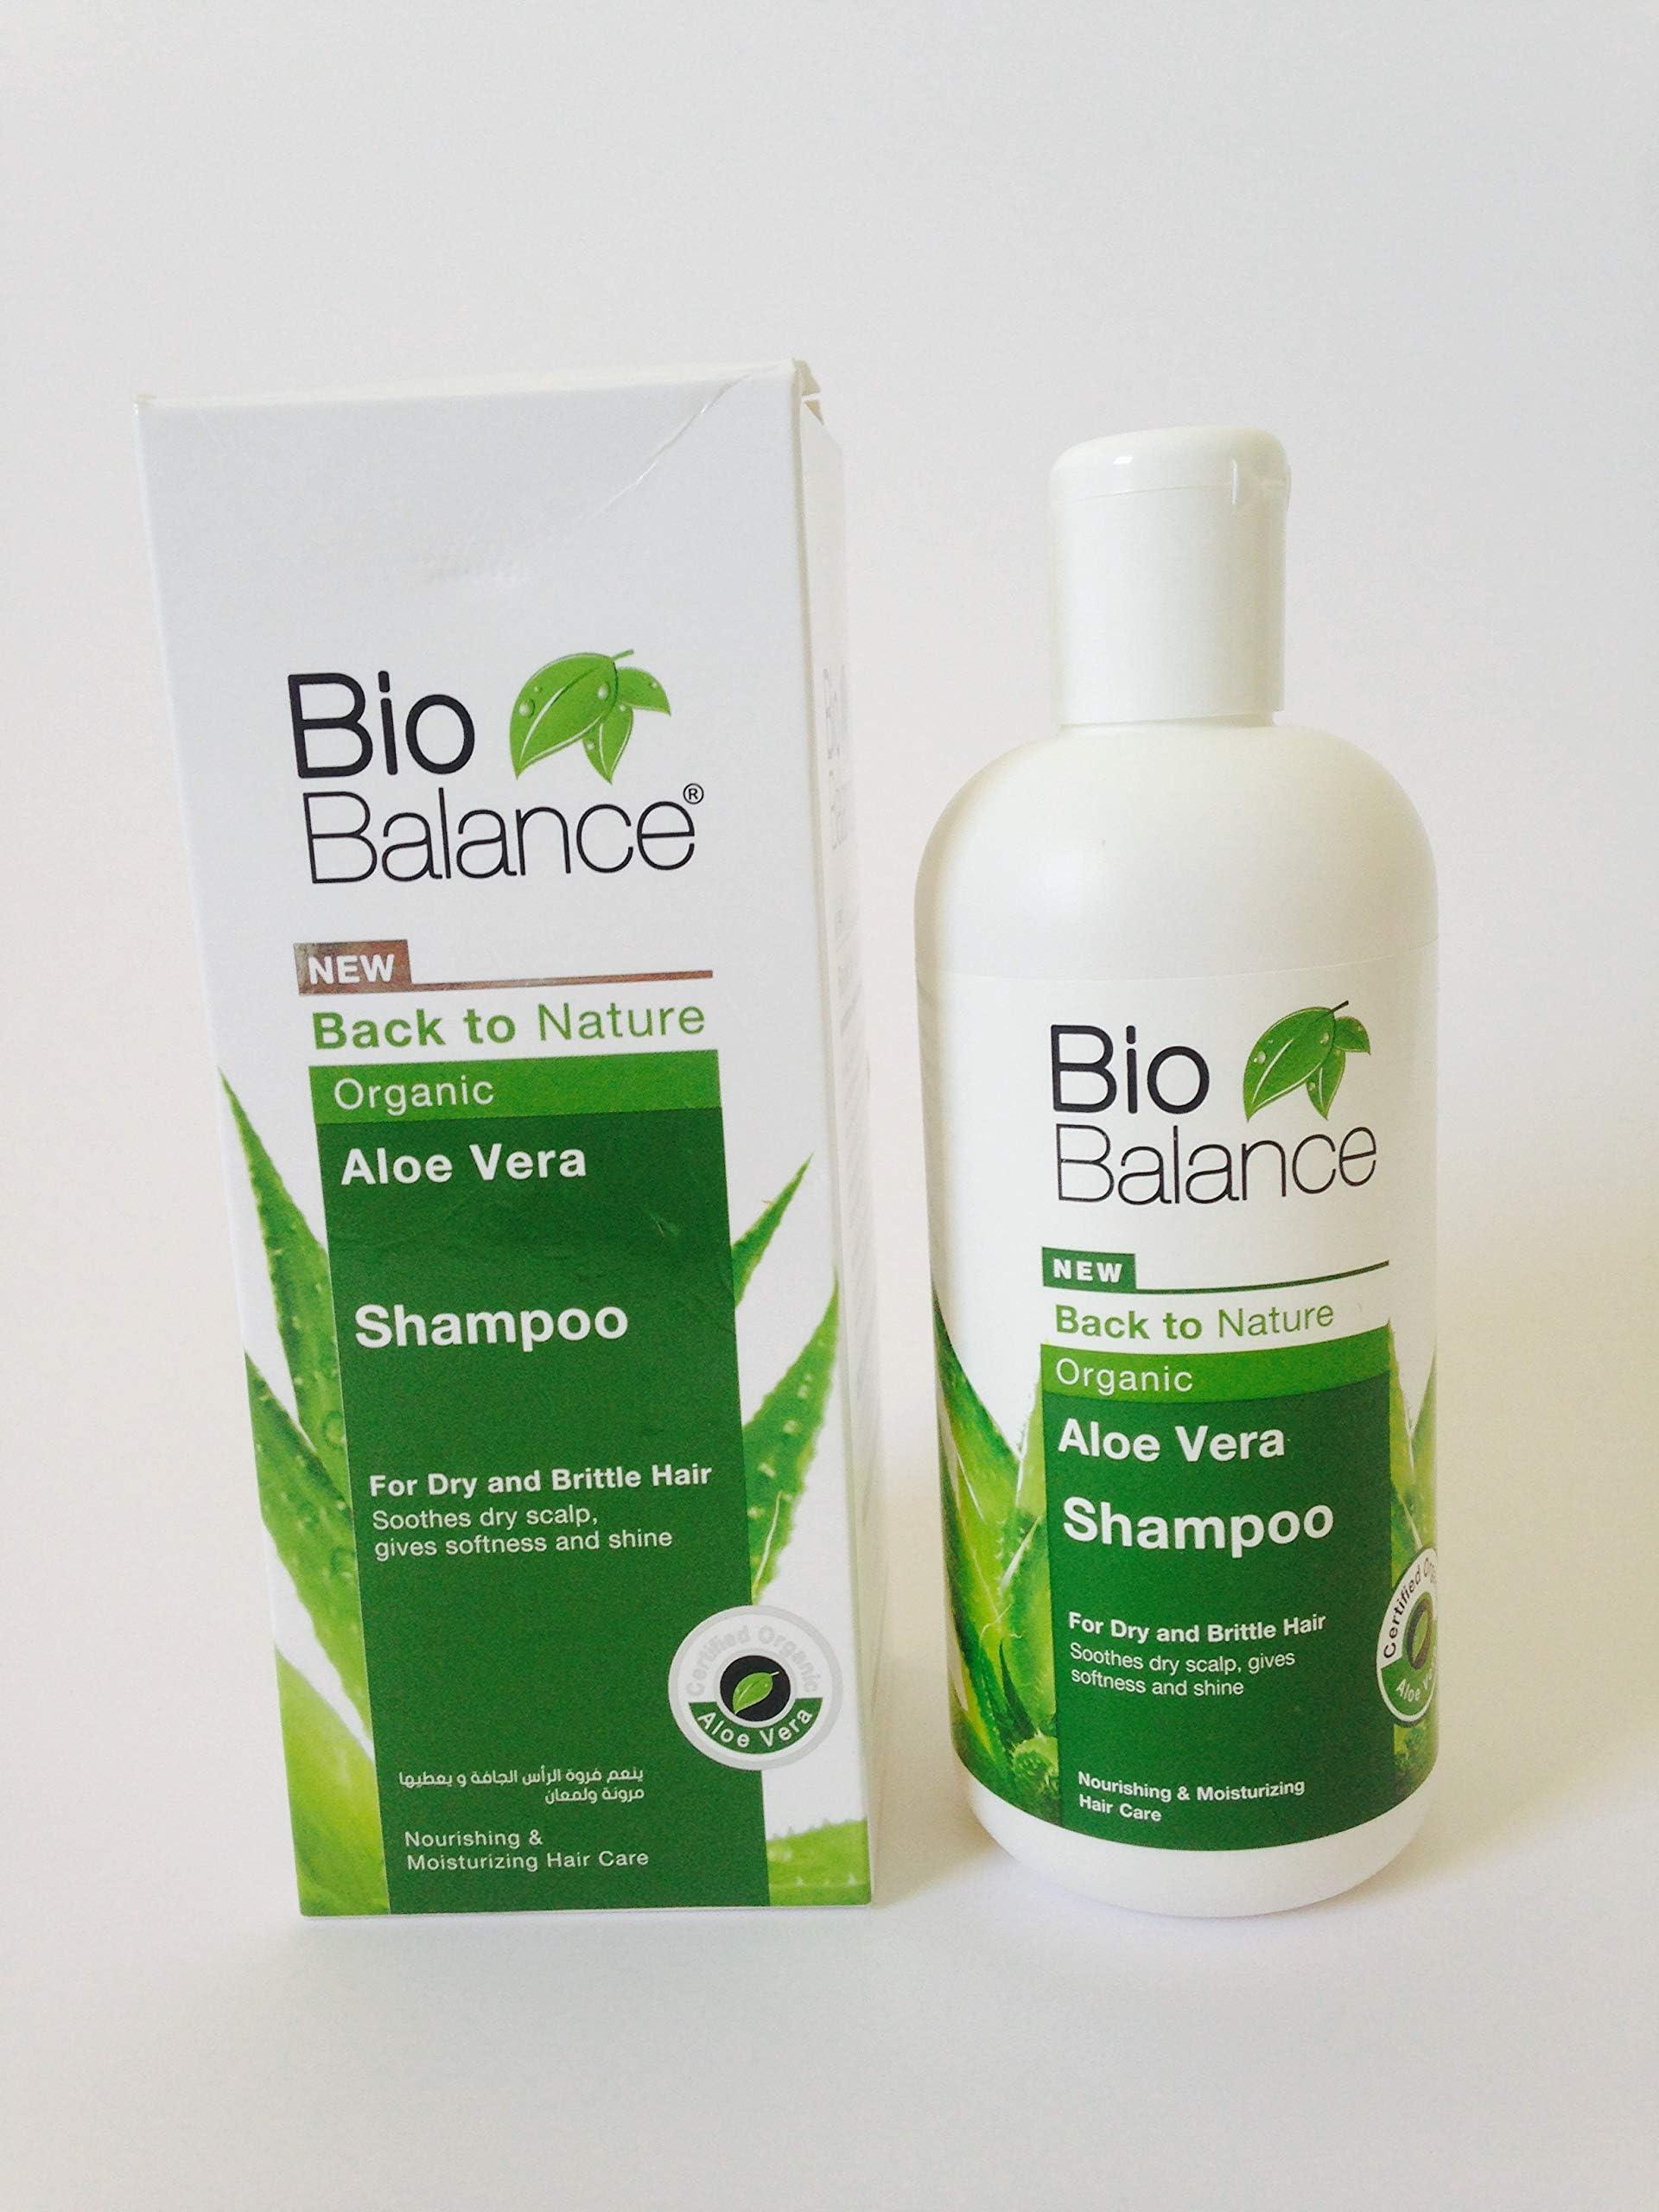 Bio Balance 100 Organic Aloe Vera Shampoo Price In Uae Amazon Uae Kanbkam